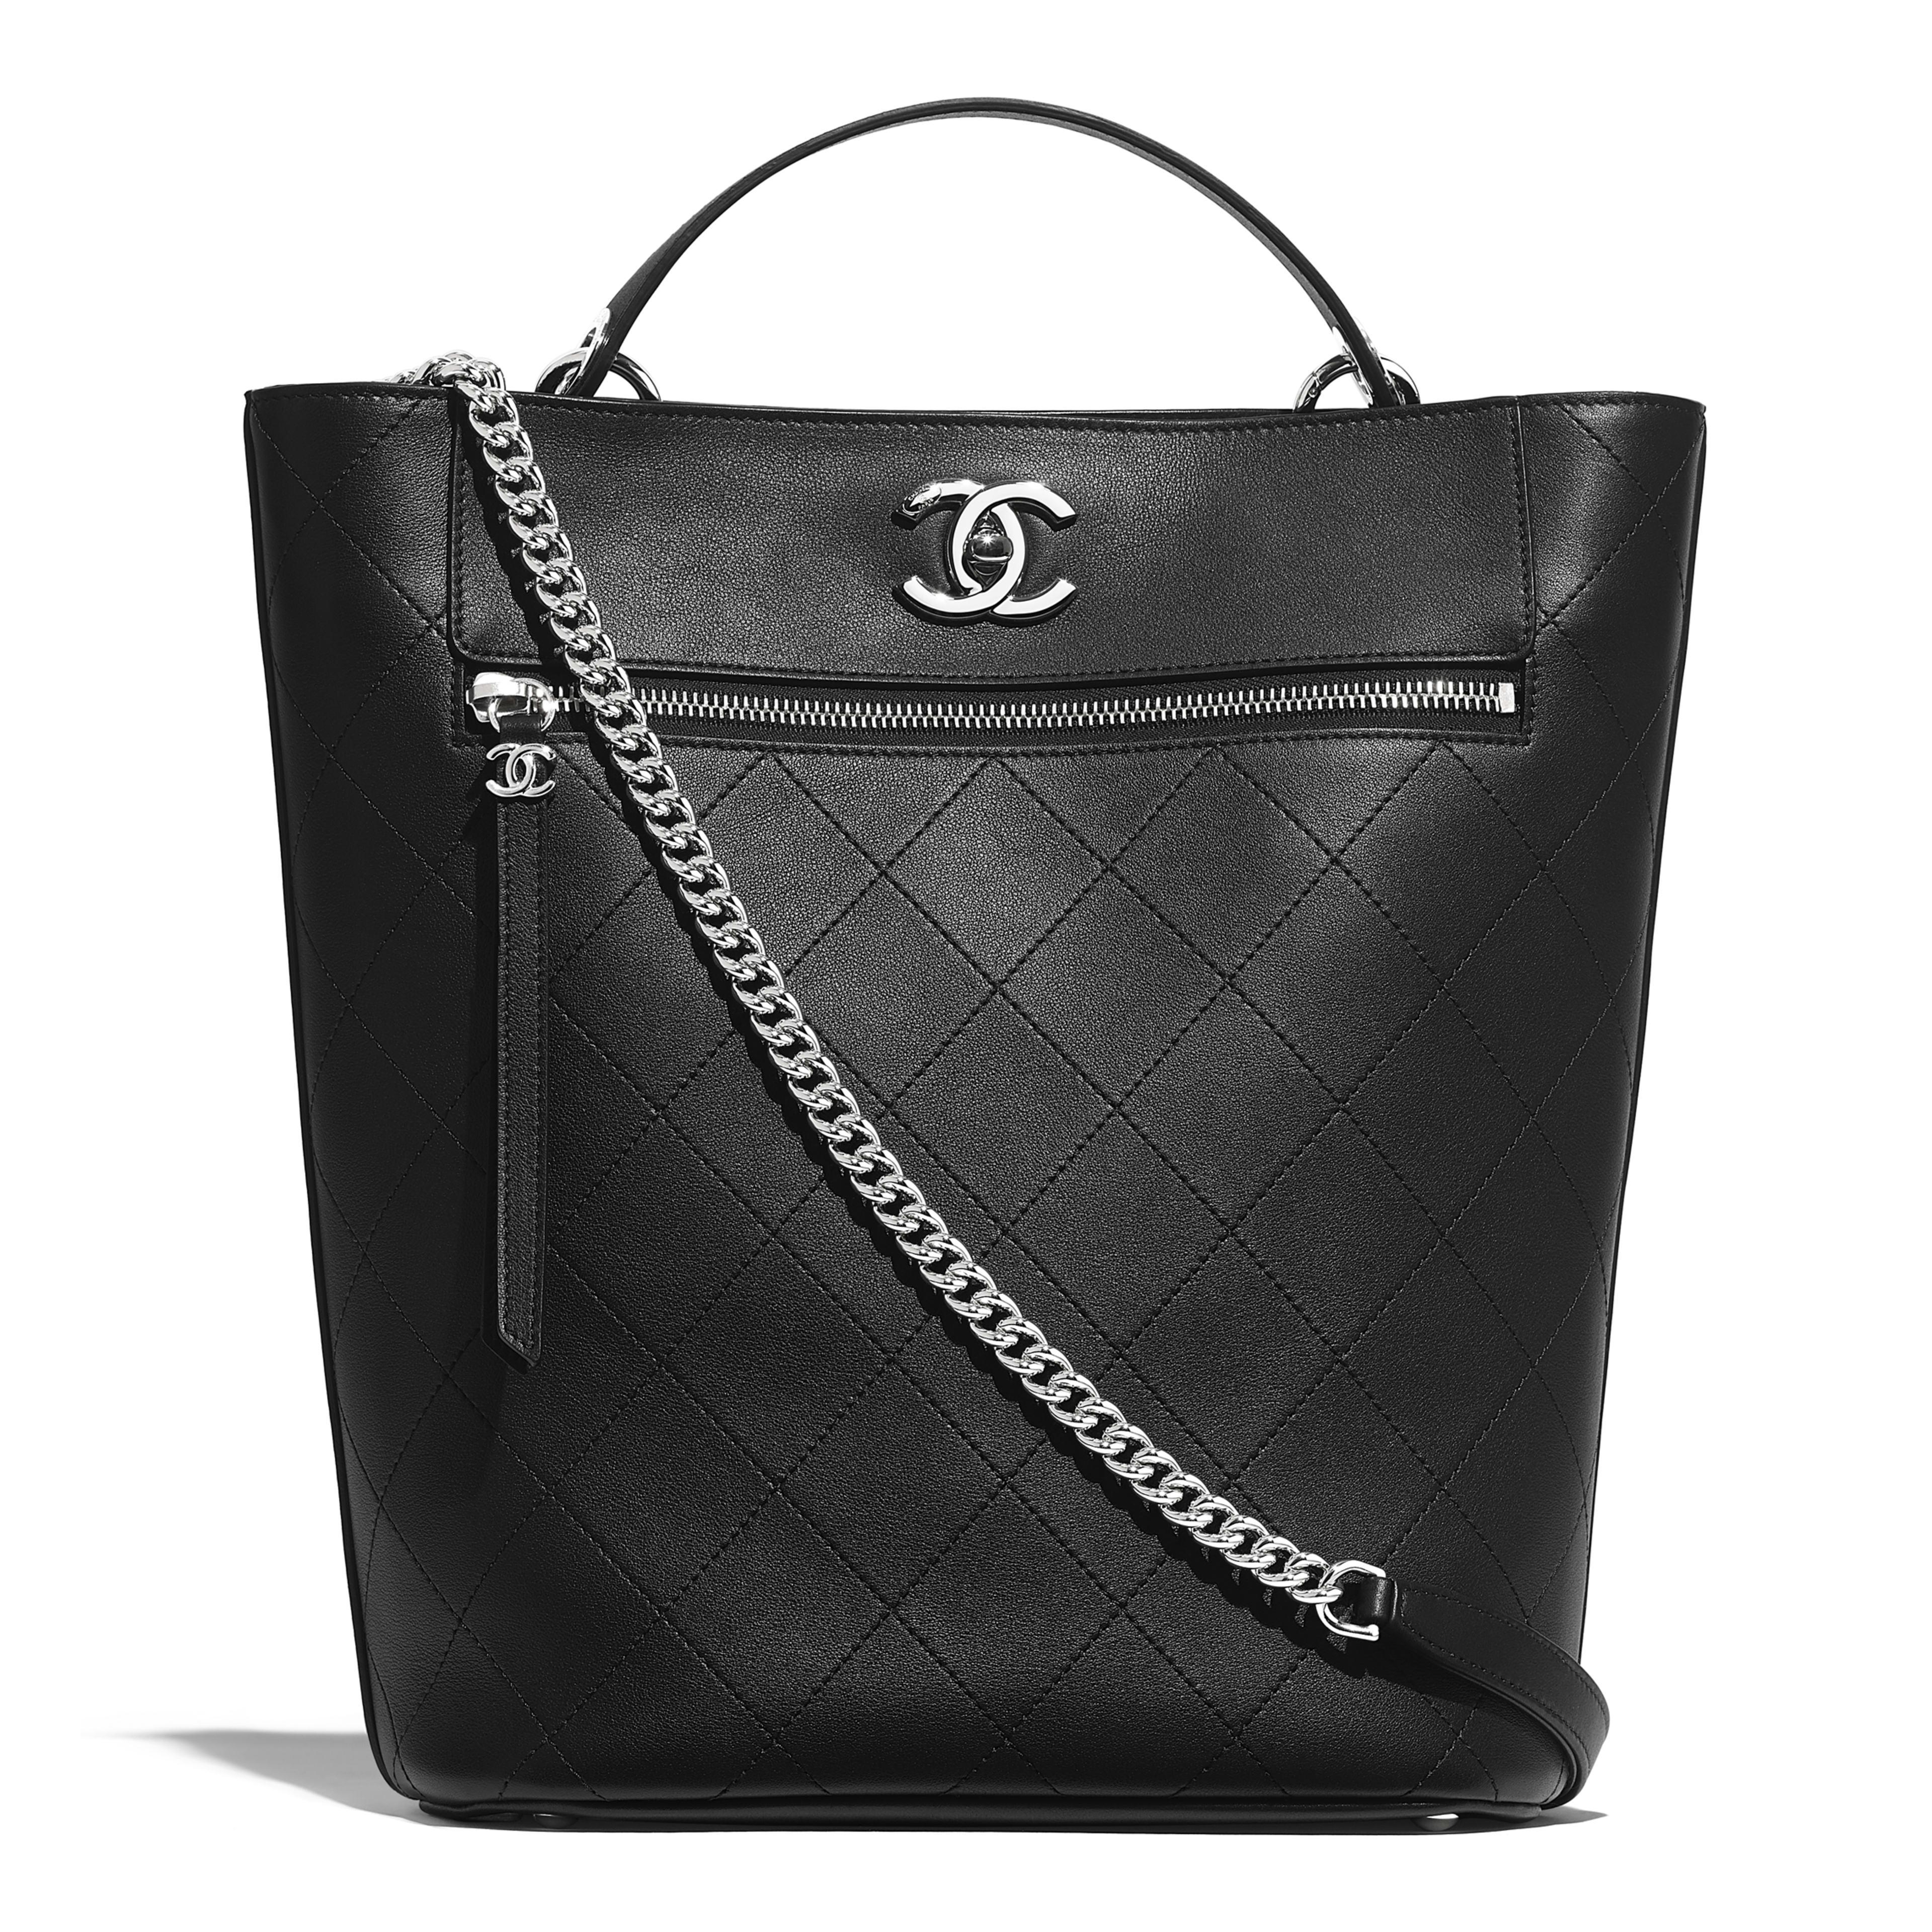 e600d5a1b2ce Bucket Bag - Black - Calfskin   Silver-Tone Metal - Default view - see ...